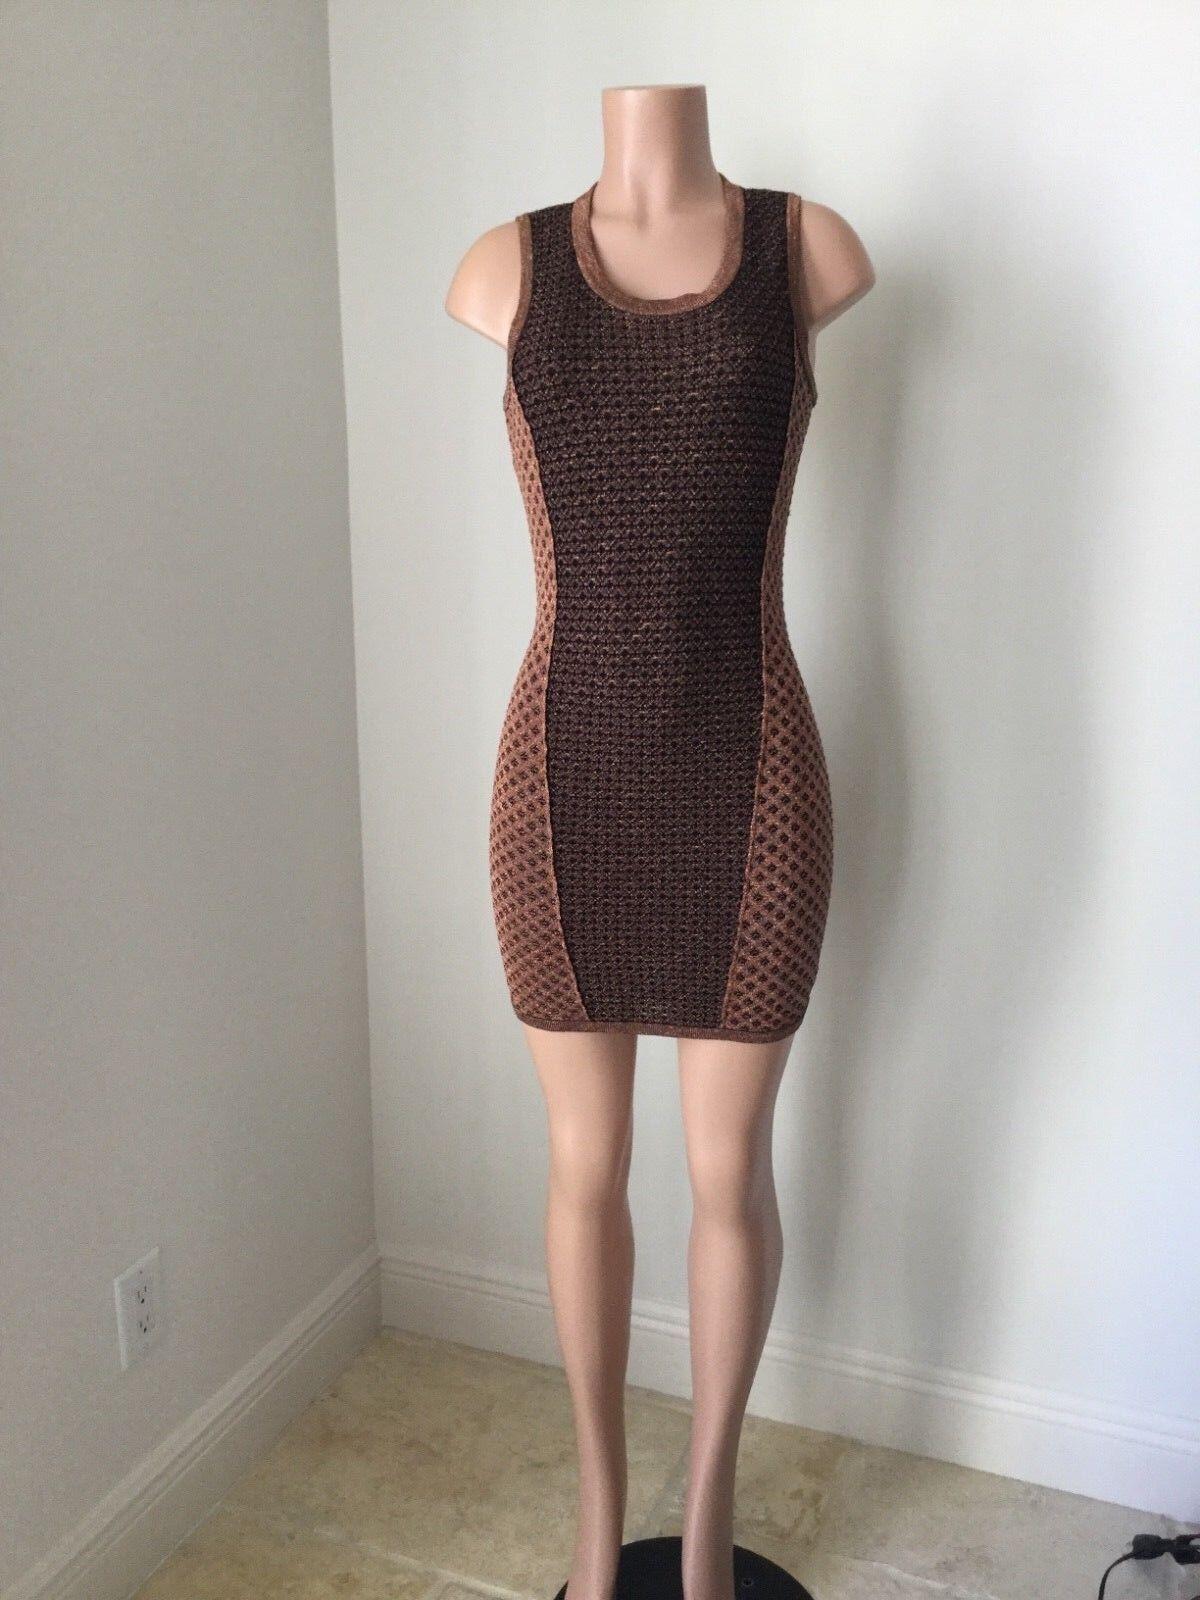 Rag & bon women's evening dresses sexy classy sleeveless metalic club wear XS